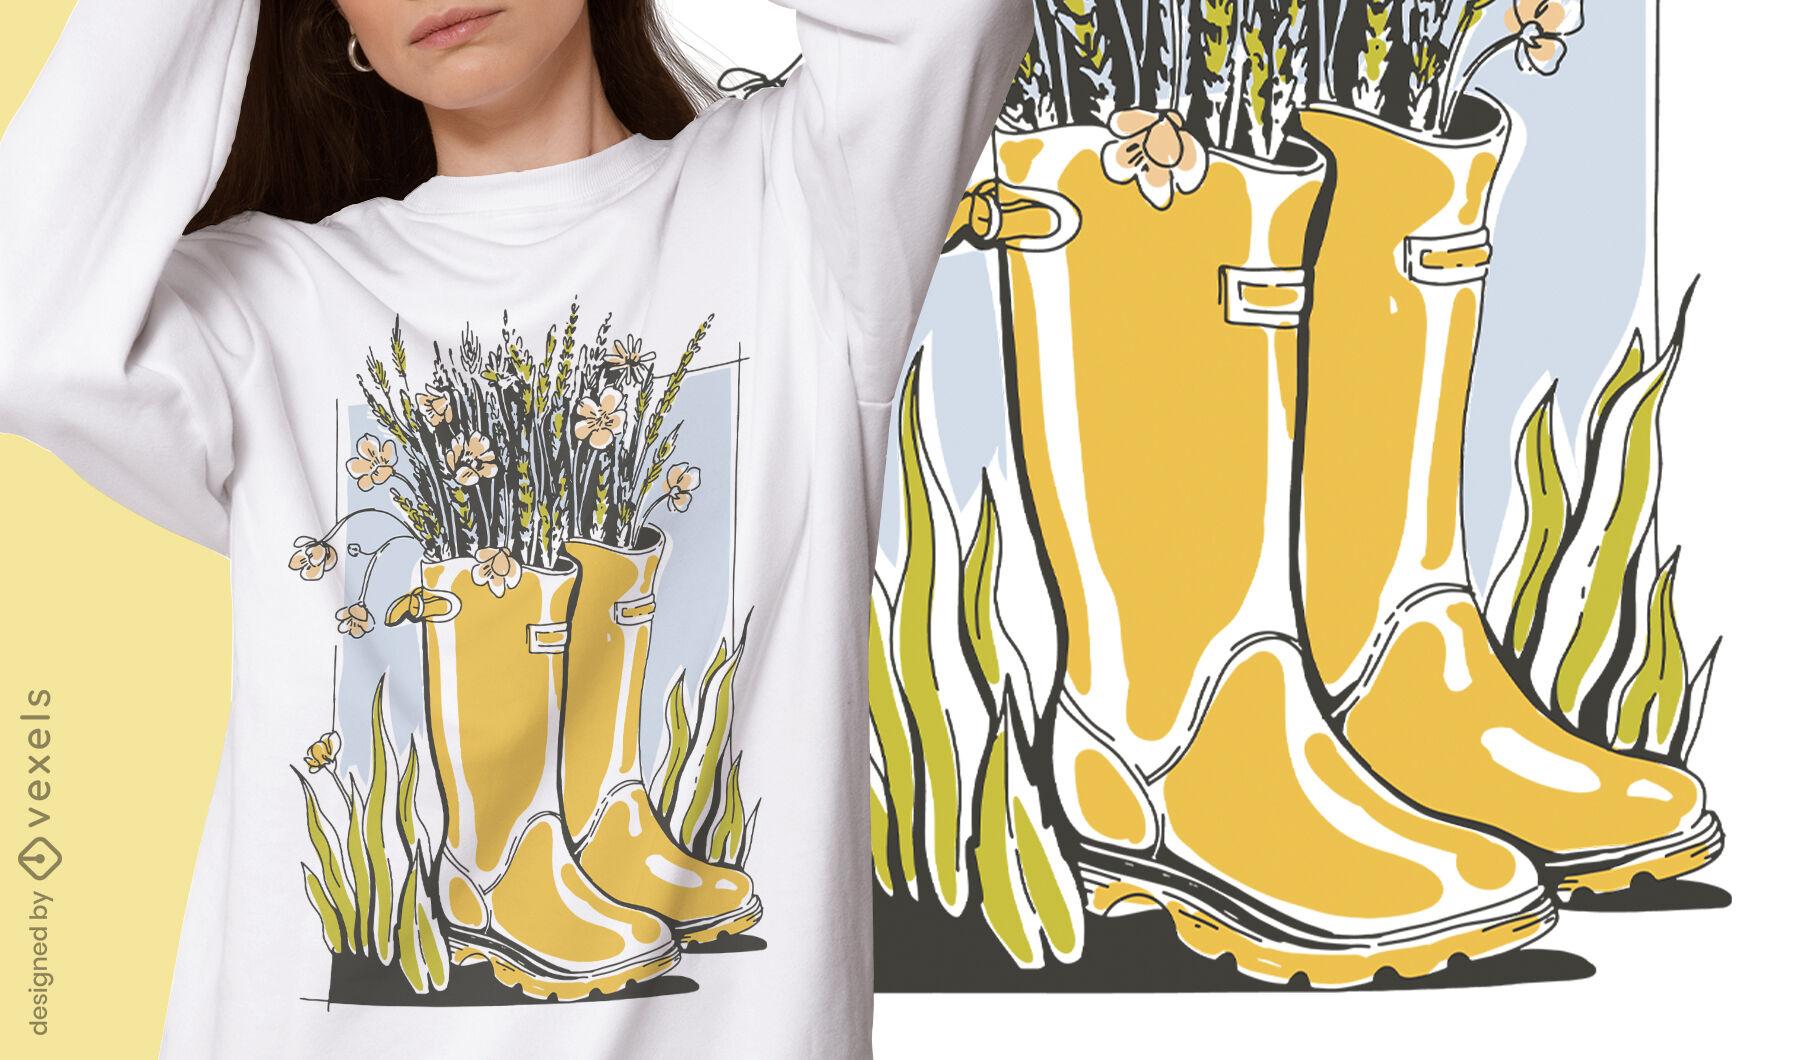 Dise?o de camiseta de botas de estilo de vida de Cottagecore